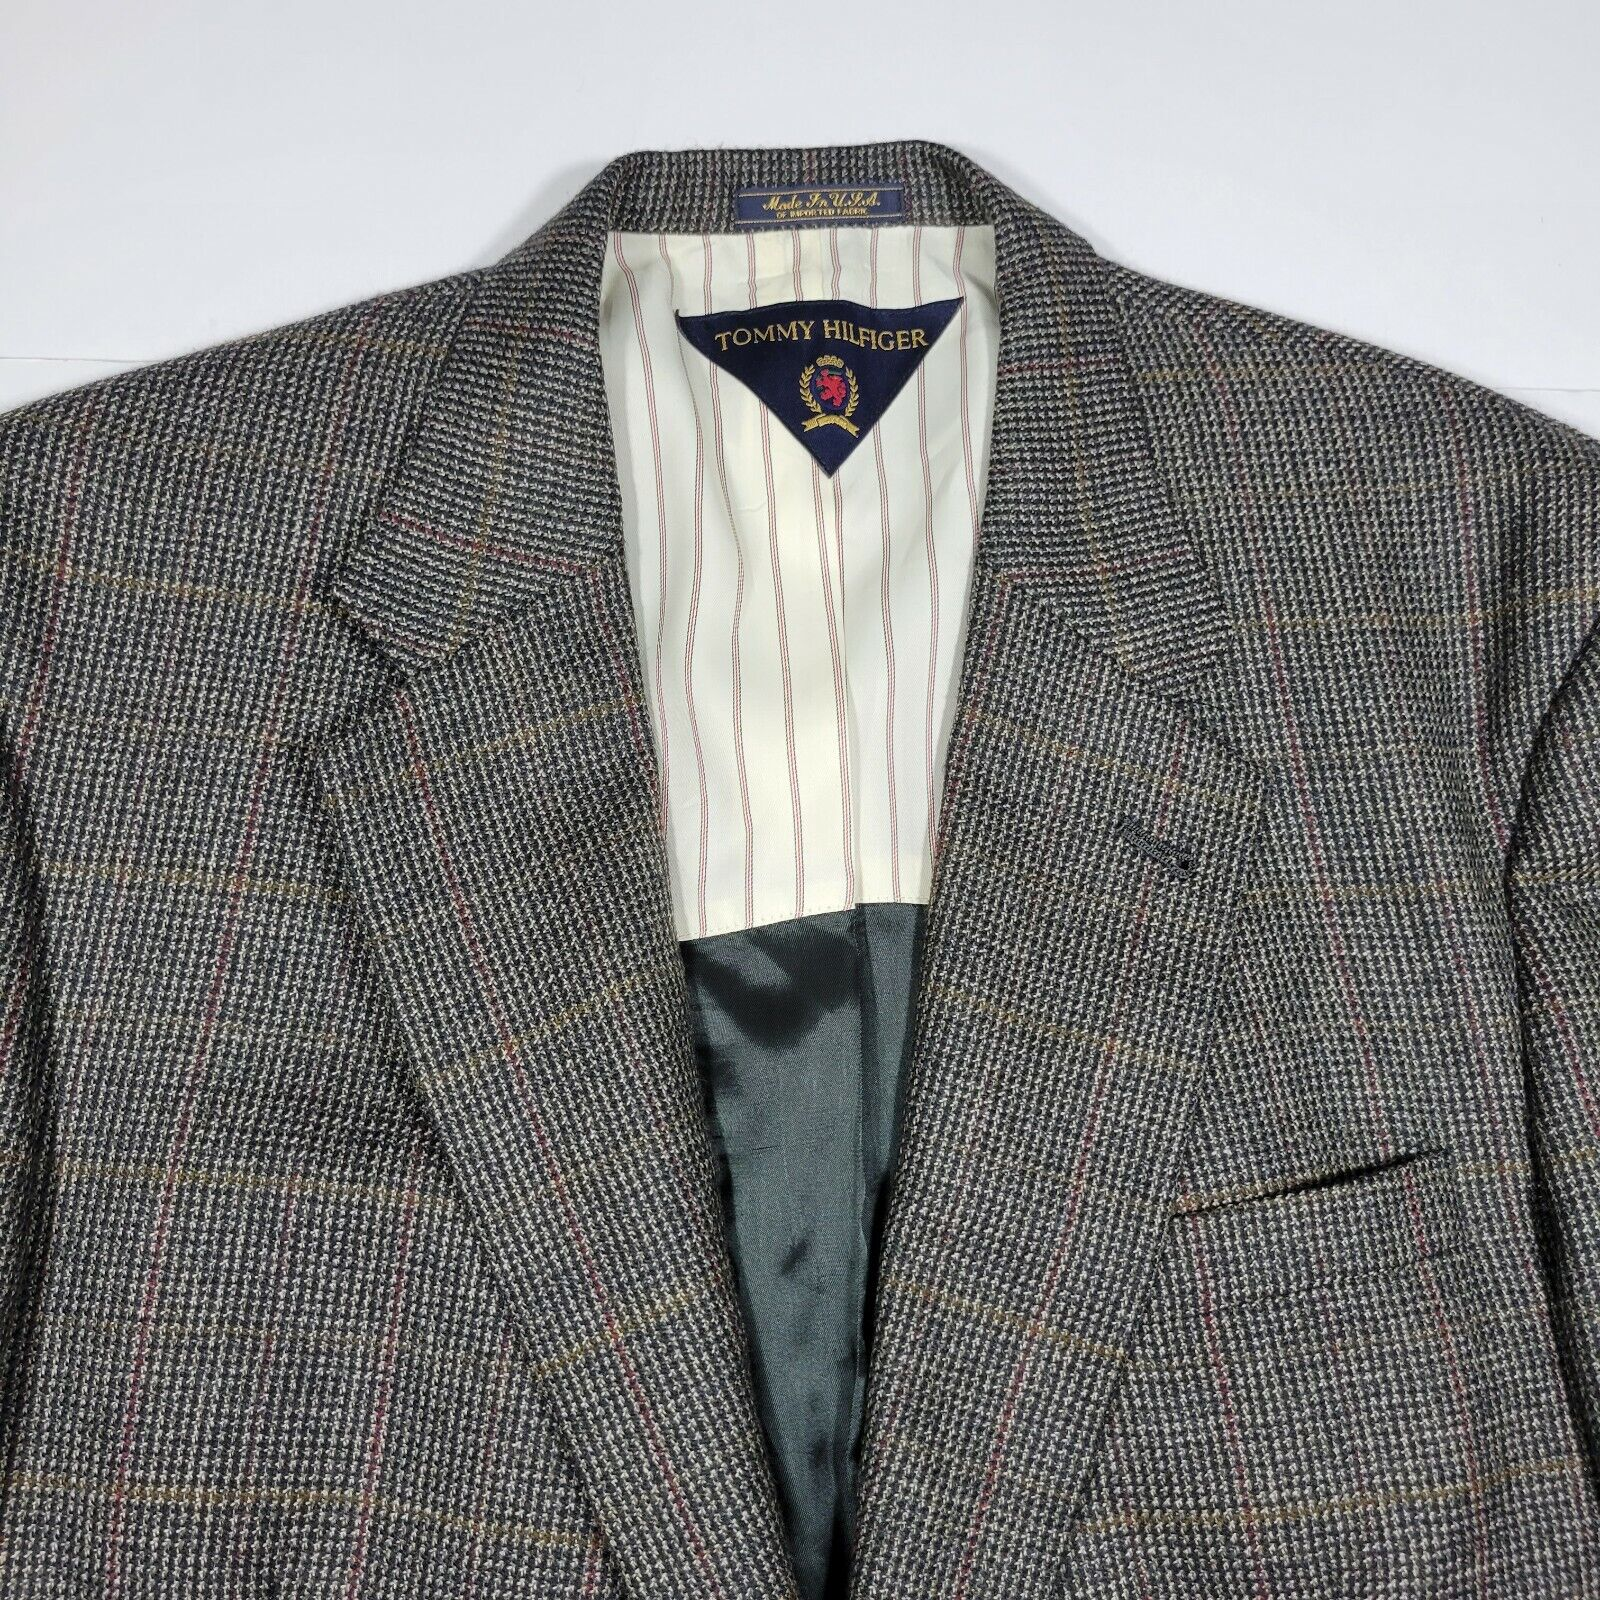 Tommy Hilfiger Sport Coat Blazer - Gray Multi Col… - image 5